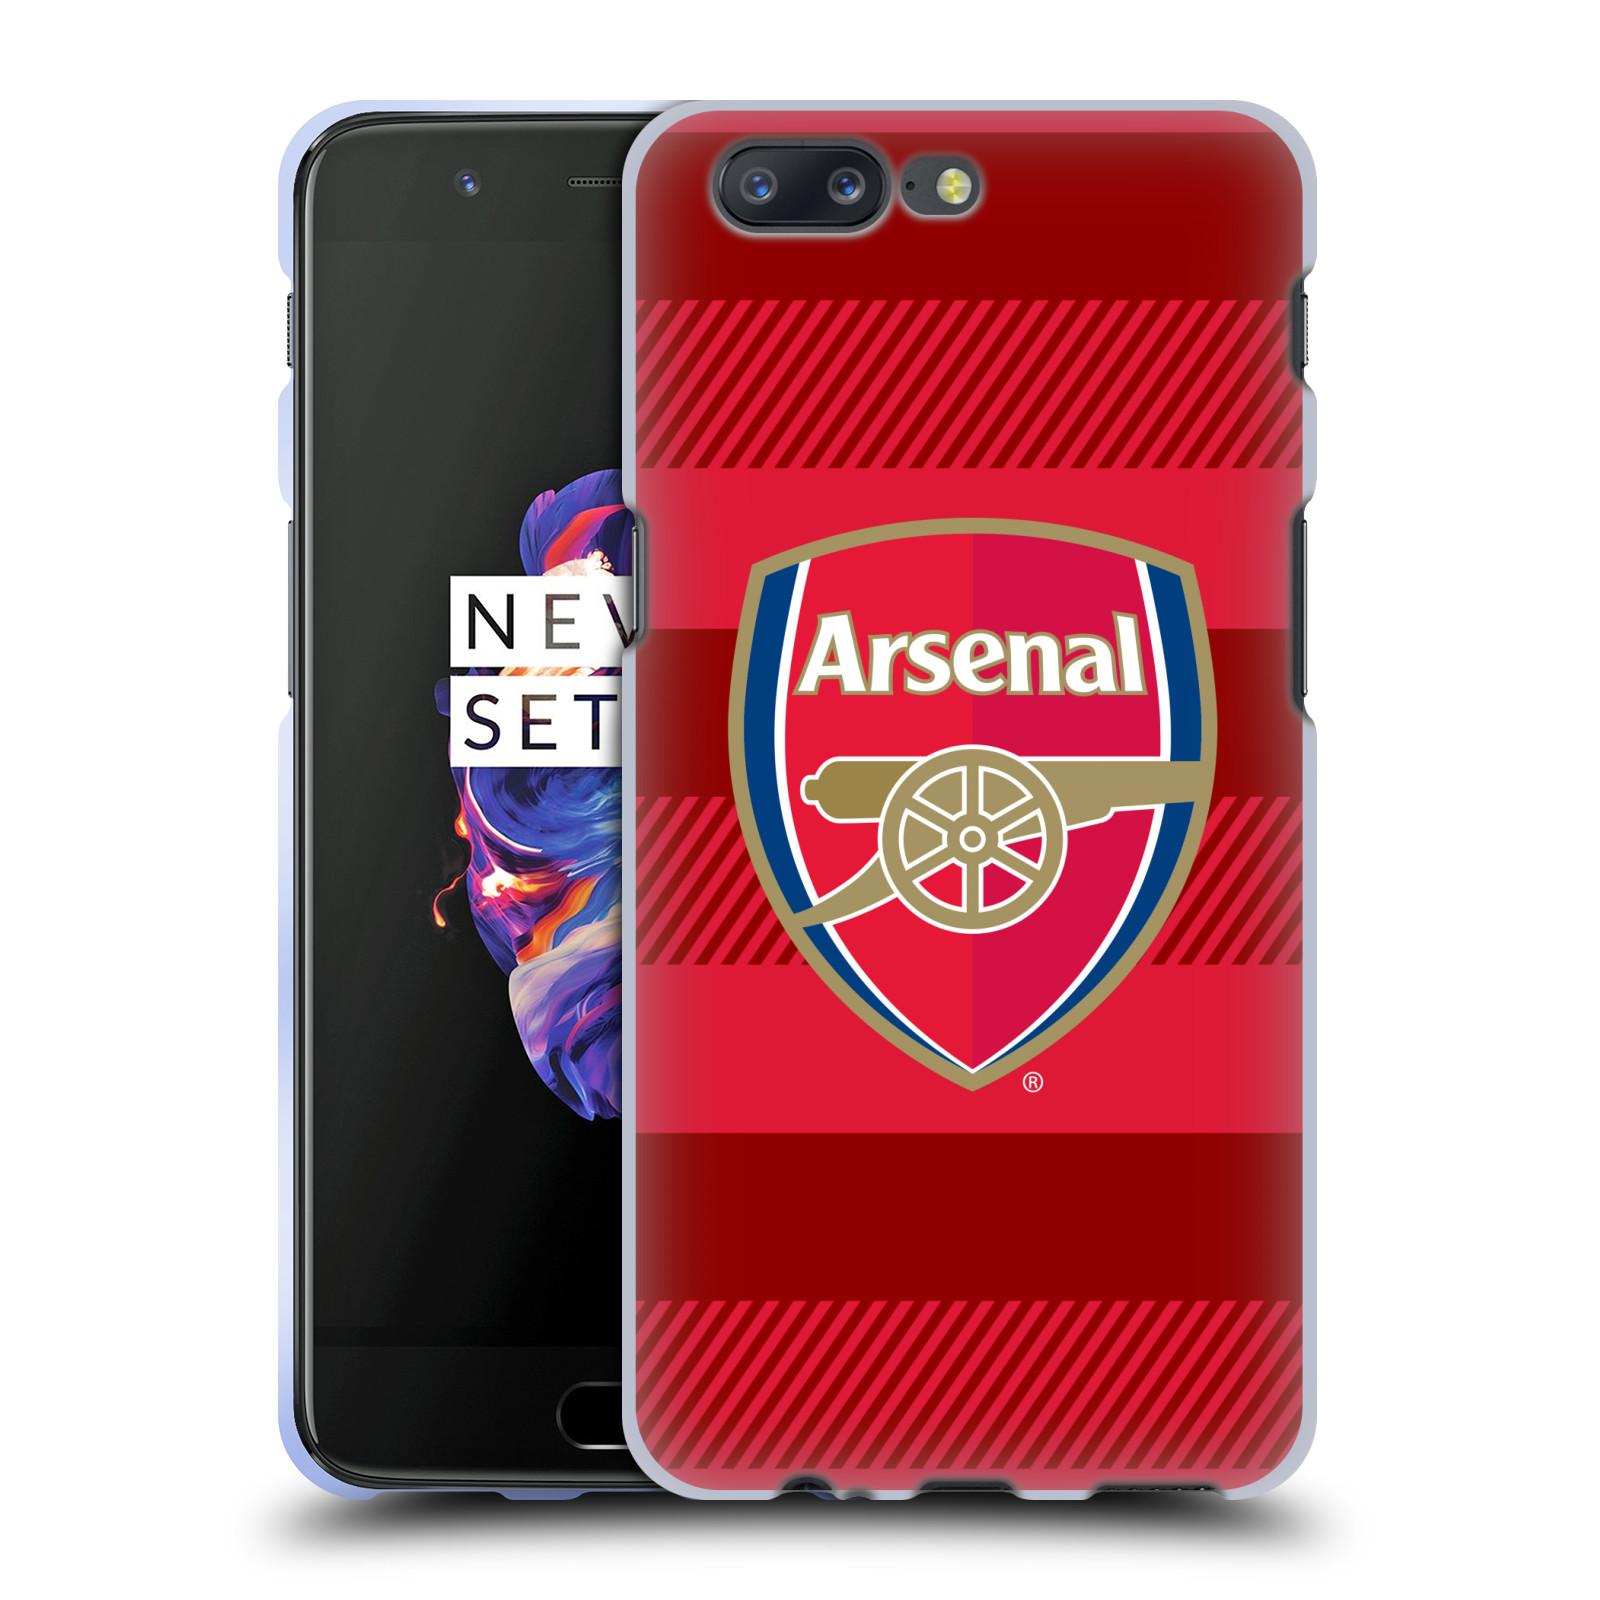 Silikonové pouzdro na mobil OnePlus 5 - Head Case - Arsenal FC - Logo s pruhy